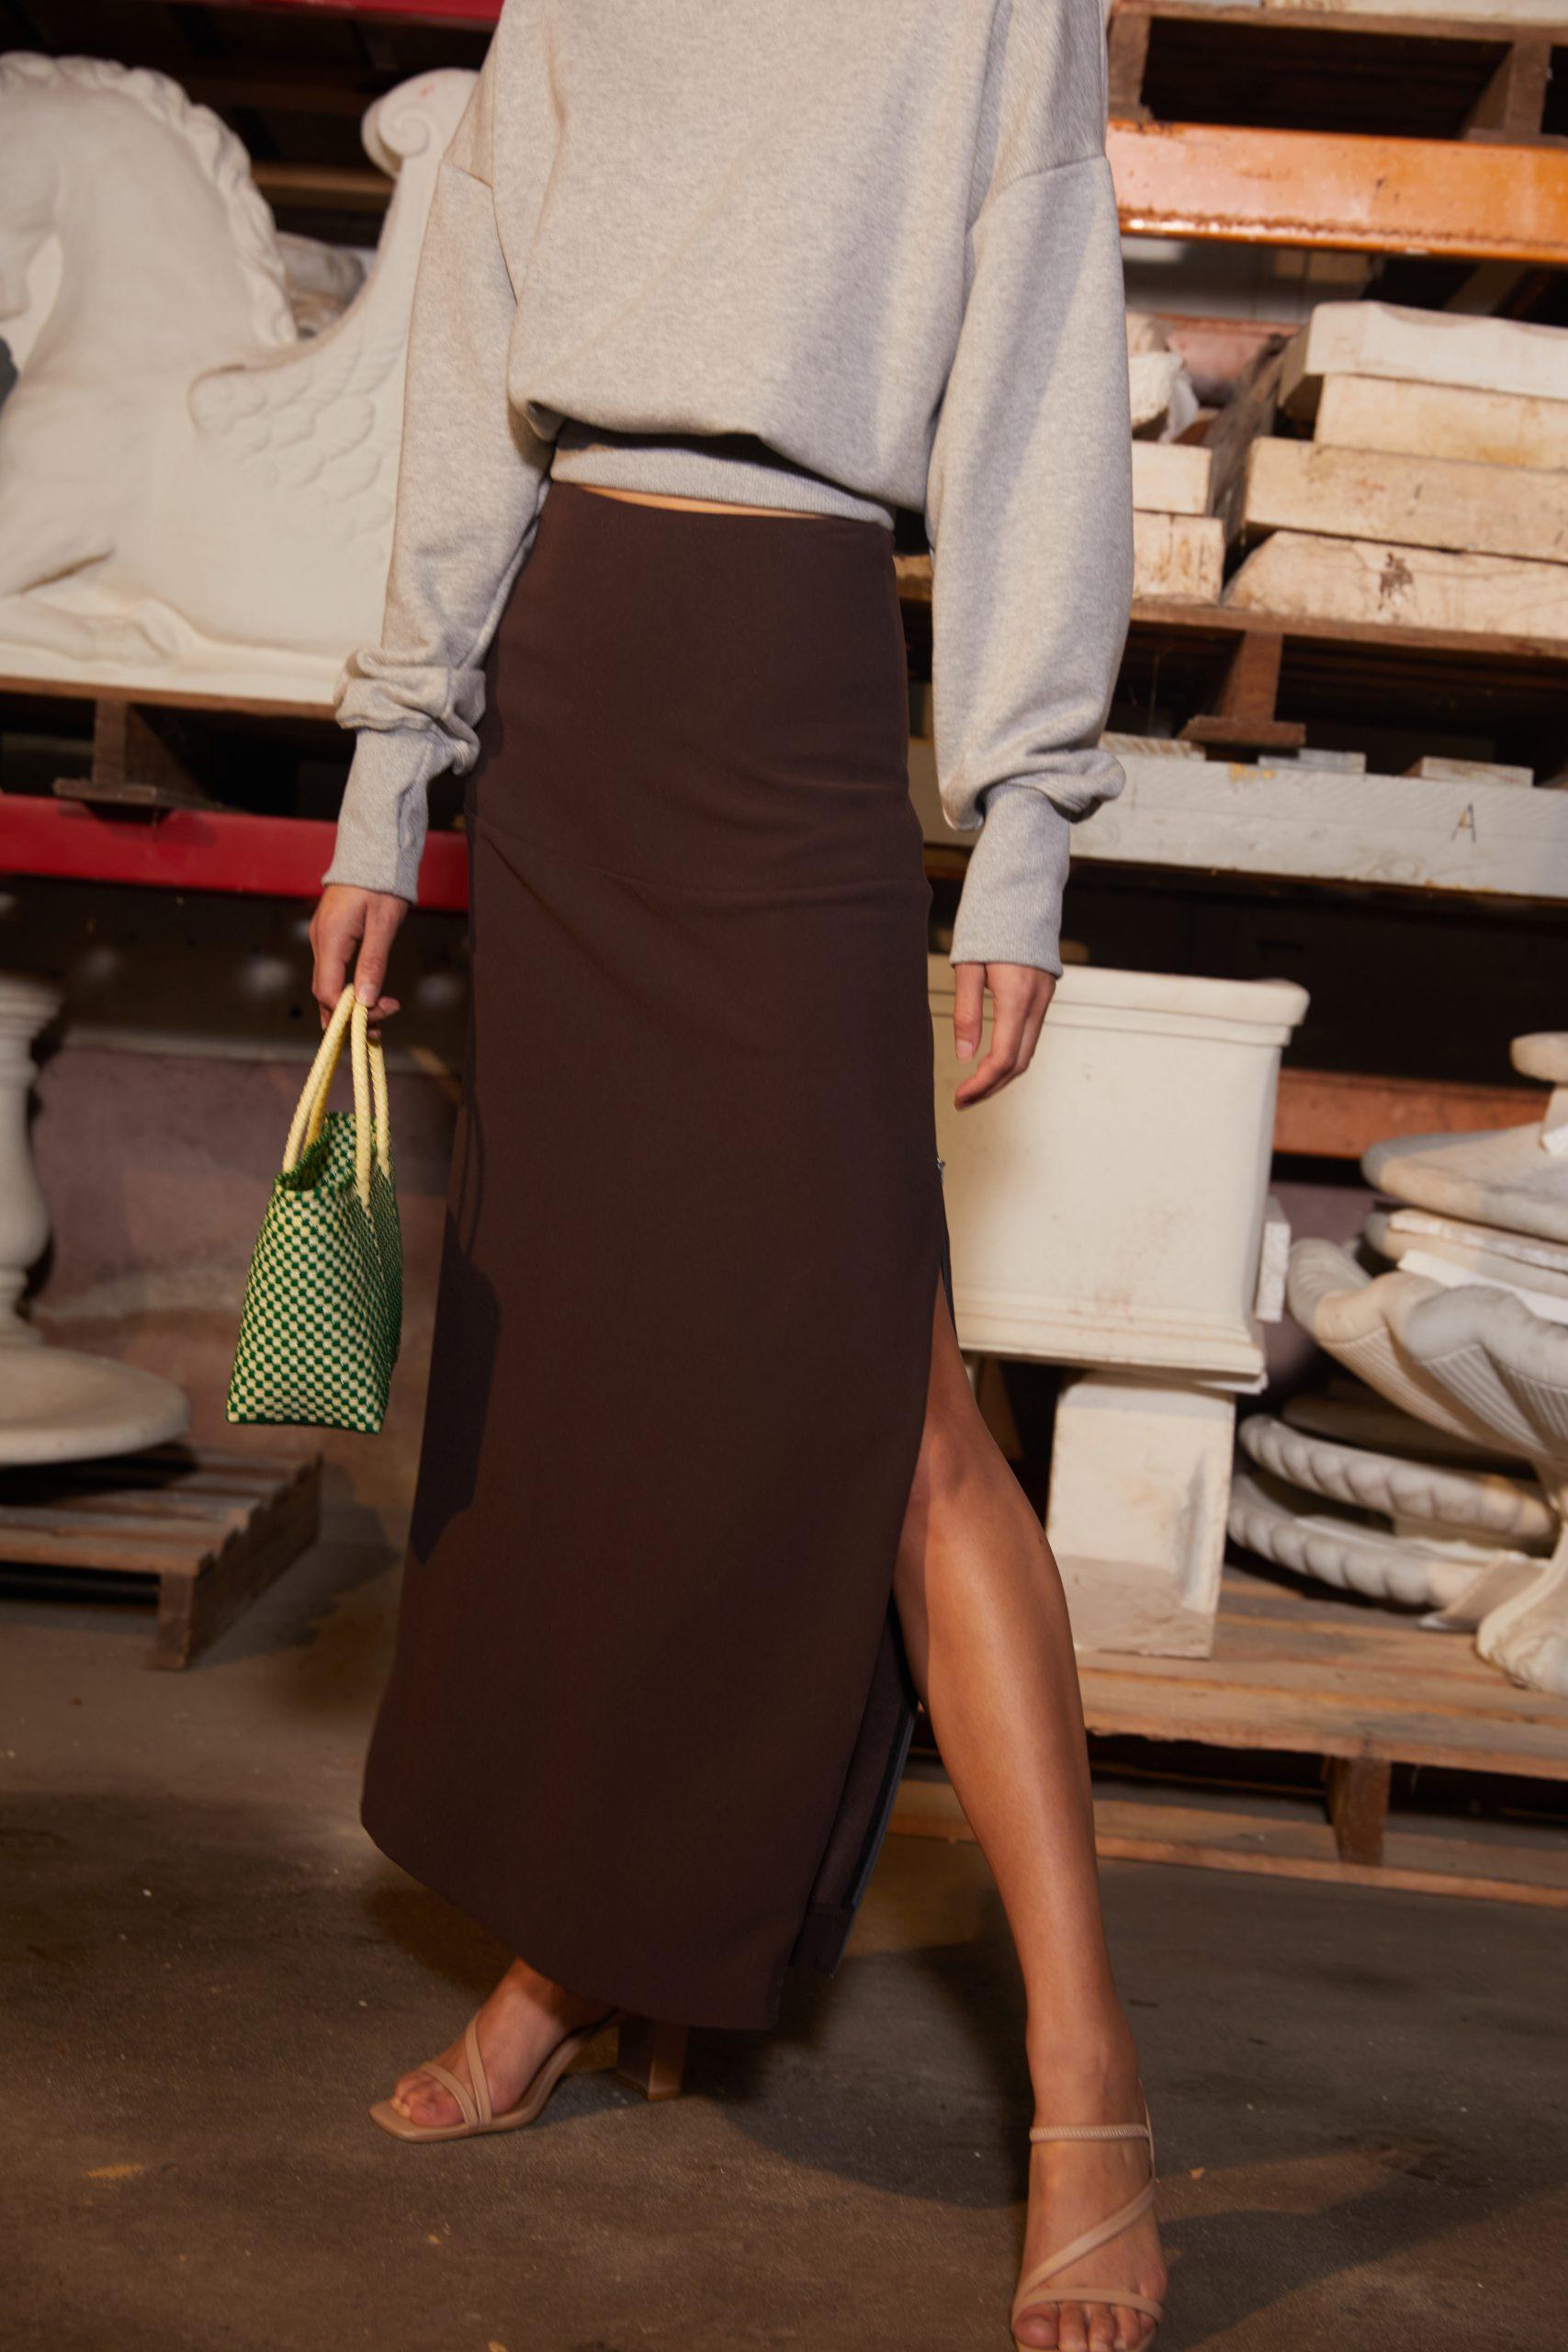 RUBY Cory Sweatshirt & Firebird Skirt Closeup